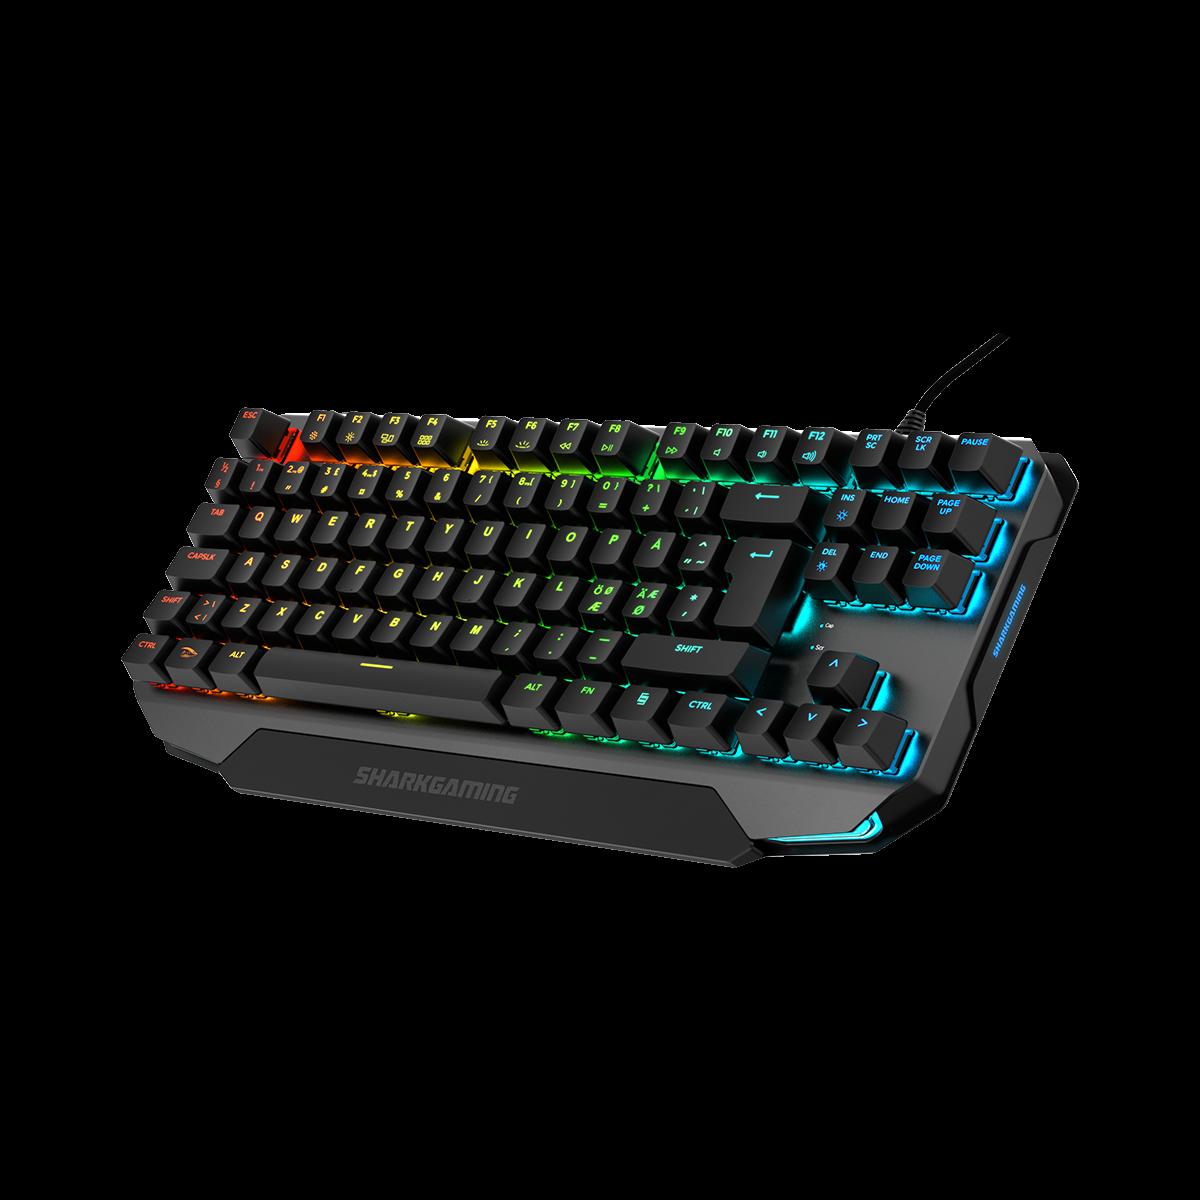 Design Shark Venator Gaming Keyboard